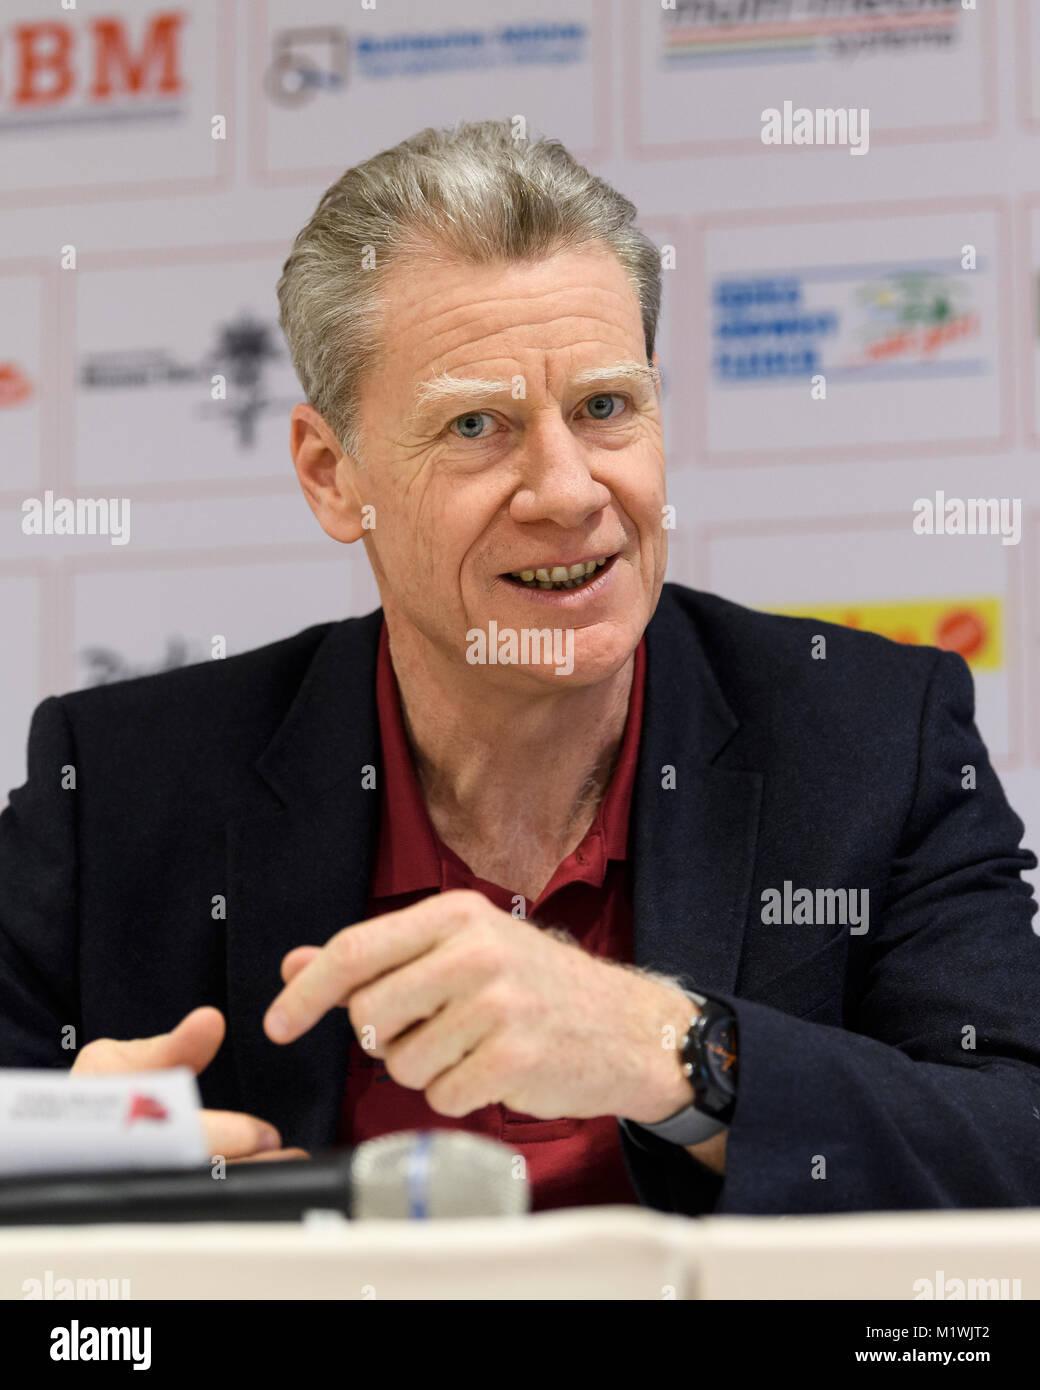 Karlsruhe, Deutschland. 02nd Feb, 2018. Meeting Direktor Alain Blondel, Portrait, PortrÃ_t, Kopfbild, Kopf. - Stock Image